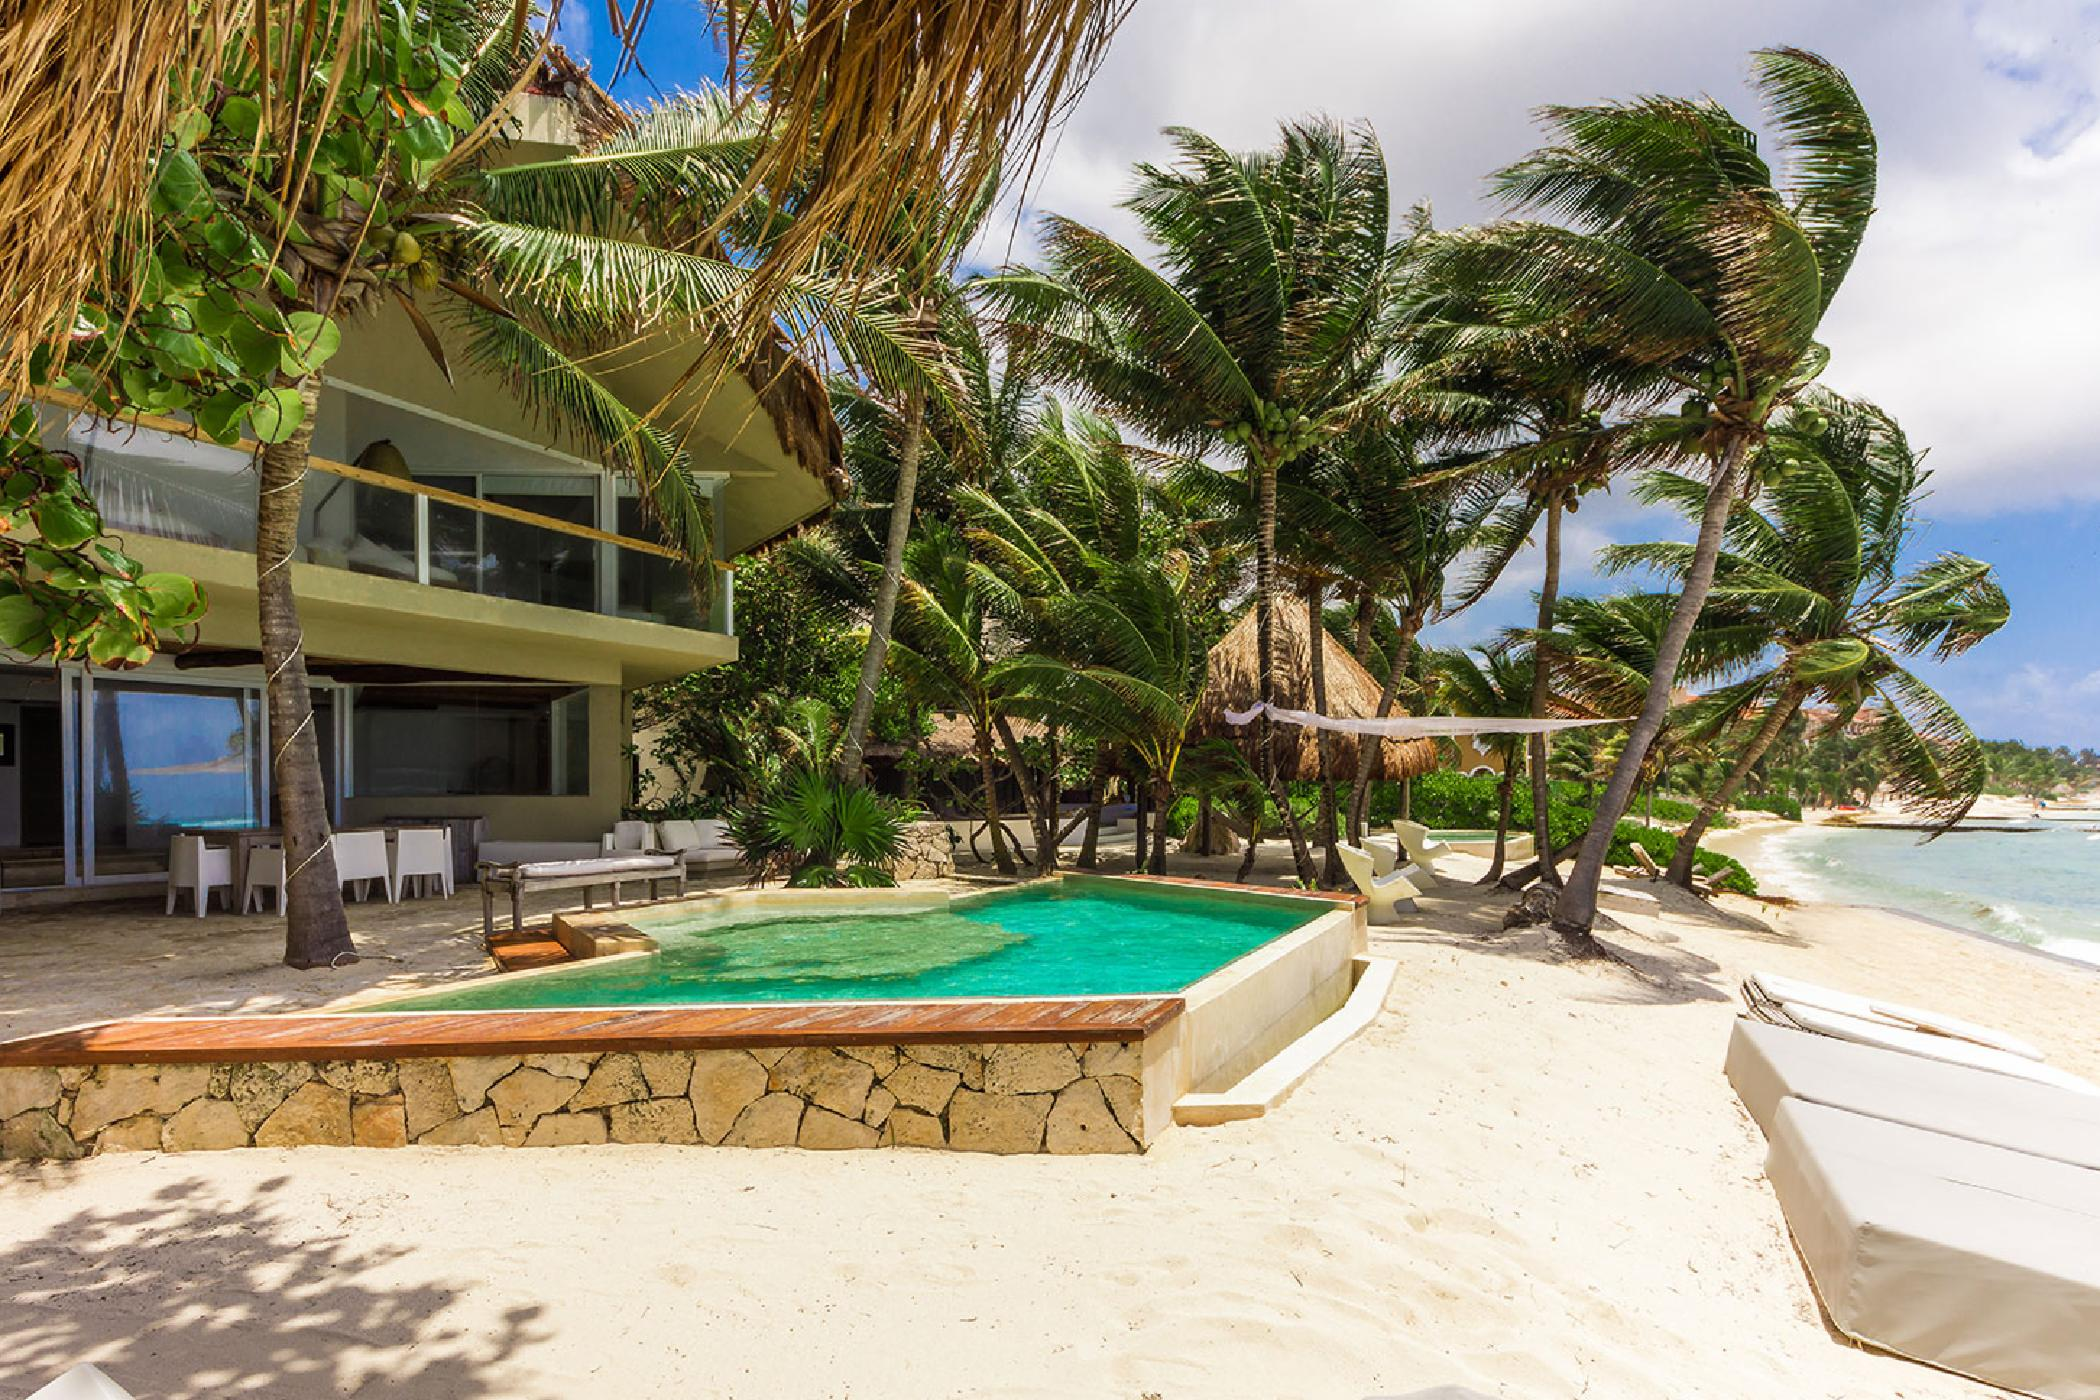 Maya_Luxe_Riviera_Maya_Luxury_Villas_Experiences_Puerto_Aventuras_5_Bedrooms_Zacil_Na_2.jpg